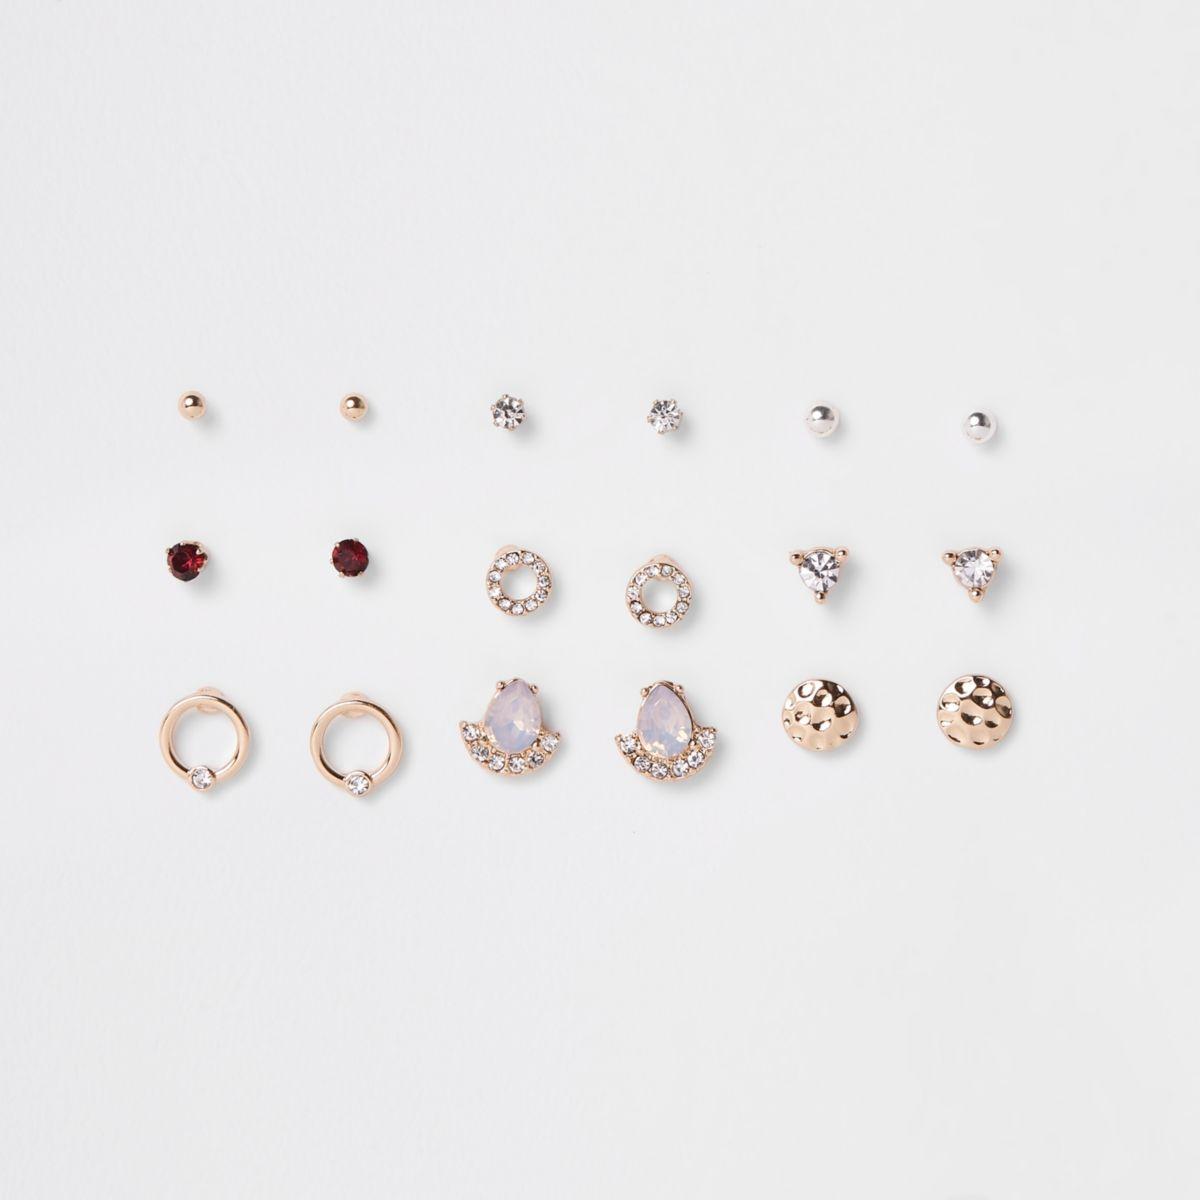 Gold tone opal diamante stud earrings pack